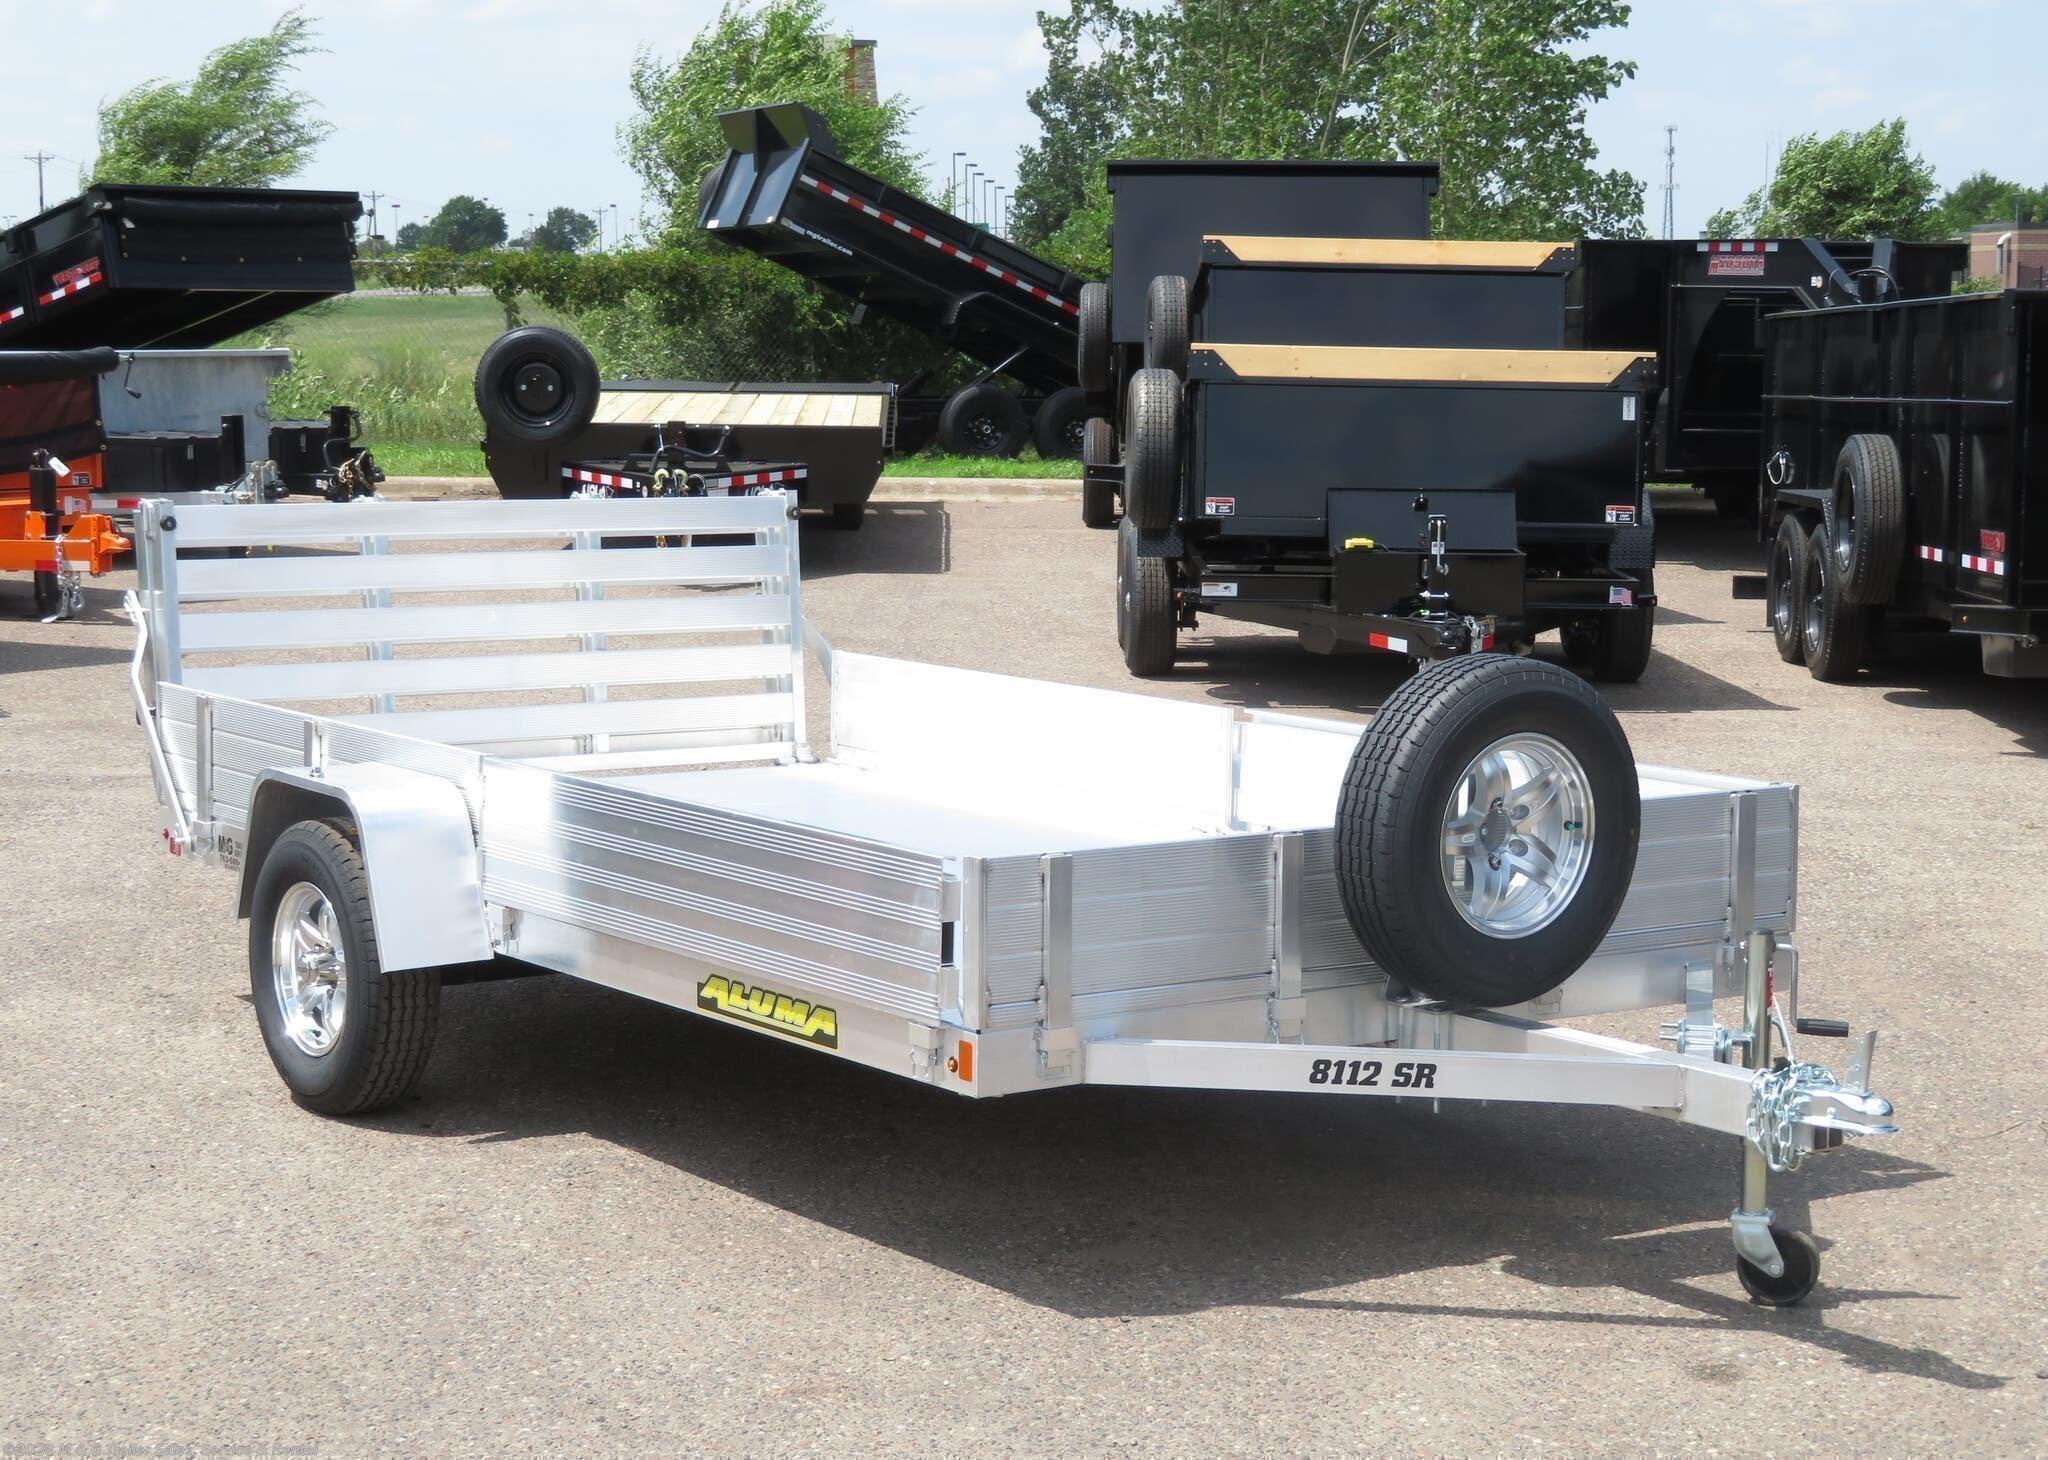 2021 Aluma 8112 SR Aluminum ATV/Utility Trailer - Stock #227168